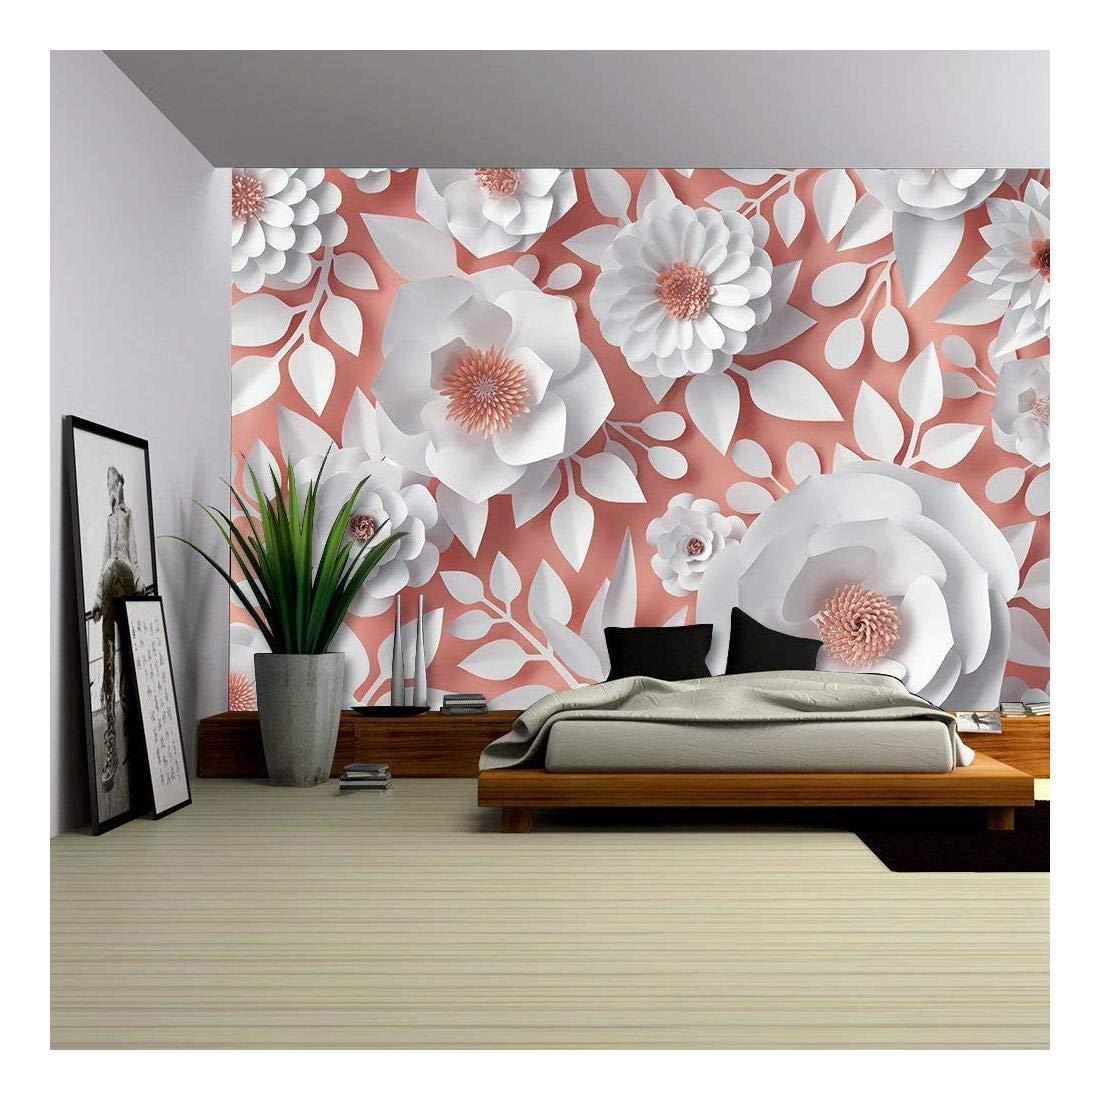 White Flowers Bridal Bouquet Vinyl Wall Mural Wall Murals Wall26